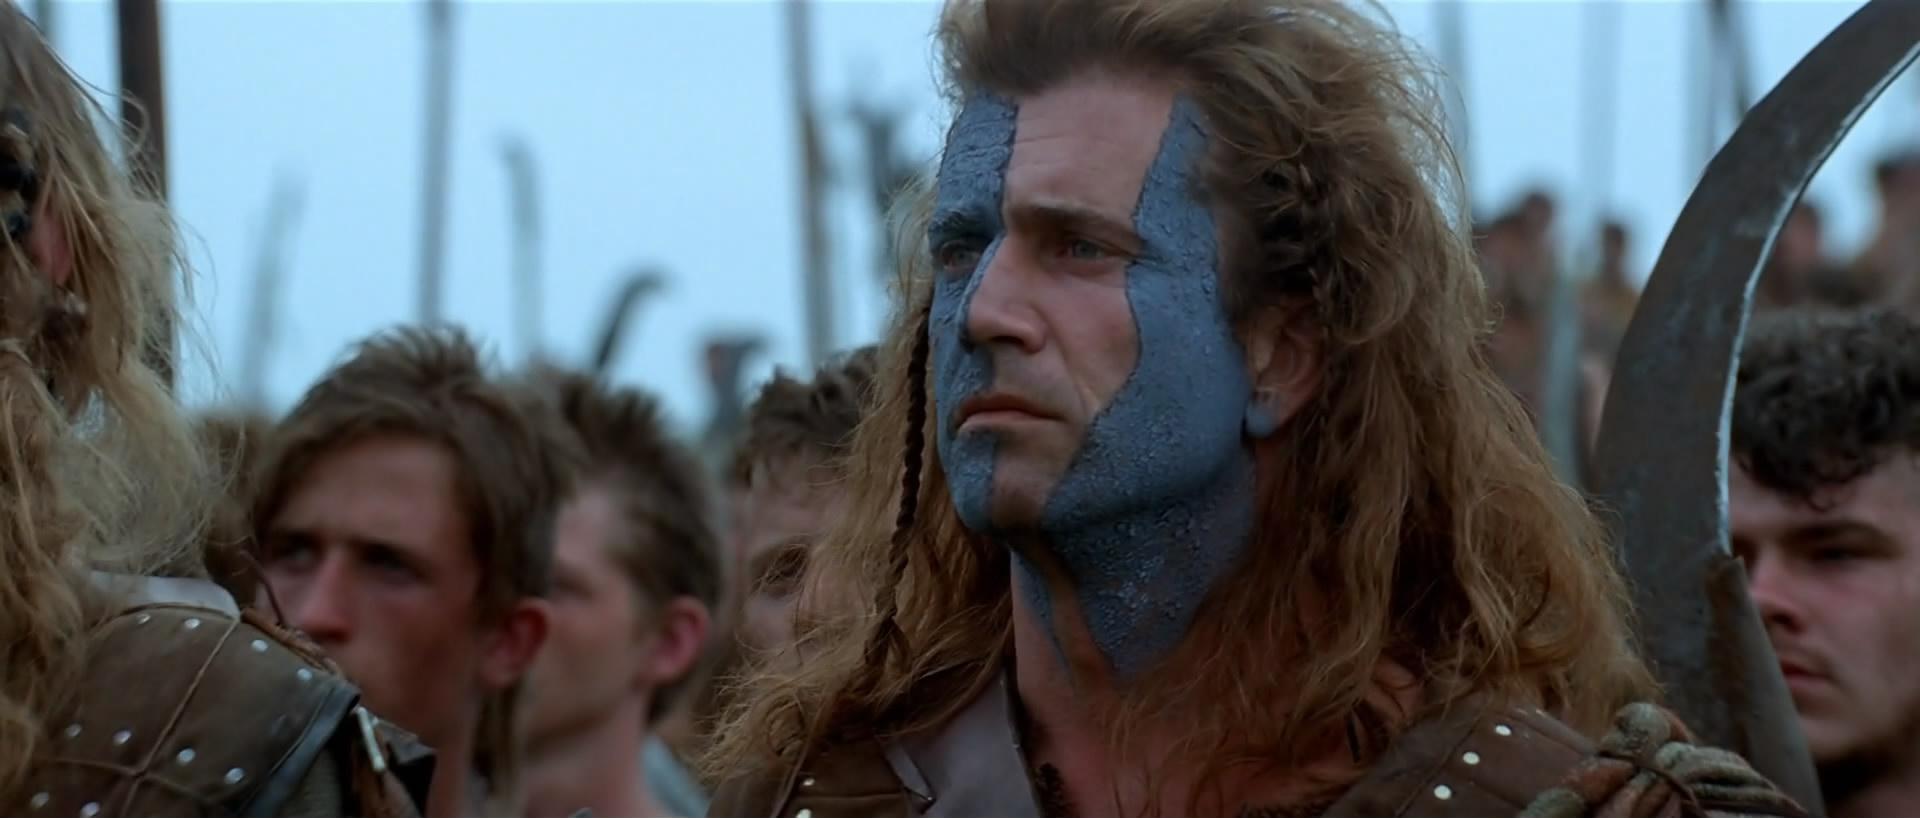 braveheart-1995-academy-awards-mel-gibson